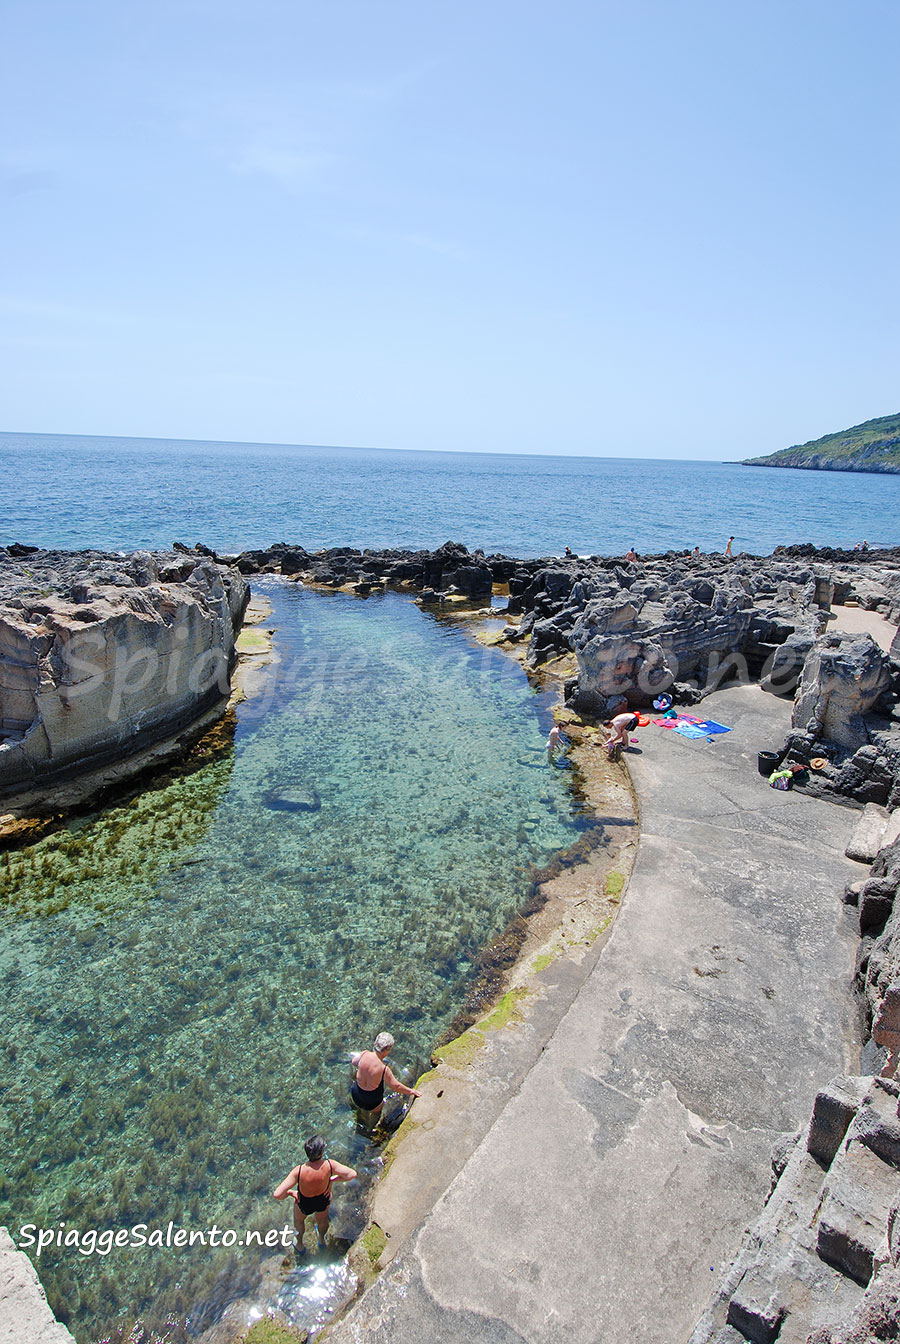 Piscina naturale marina serra salento